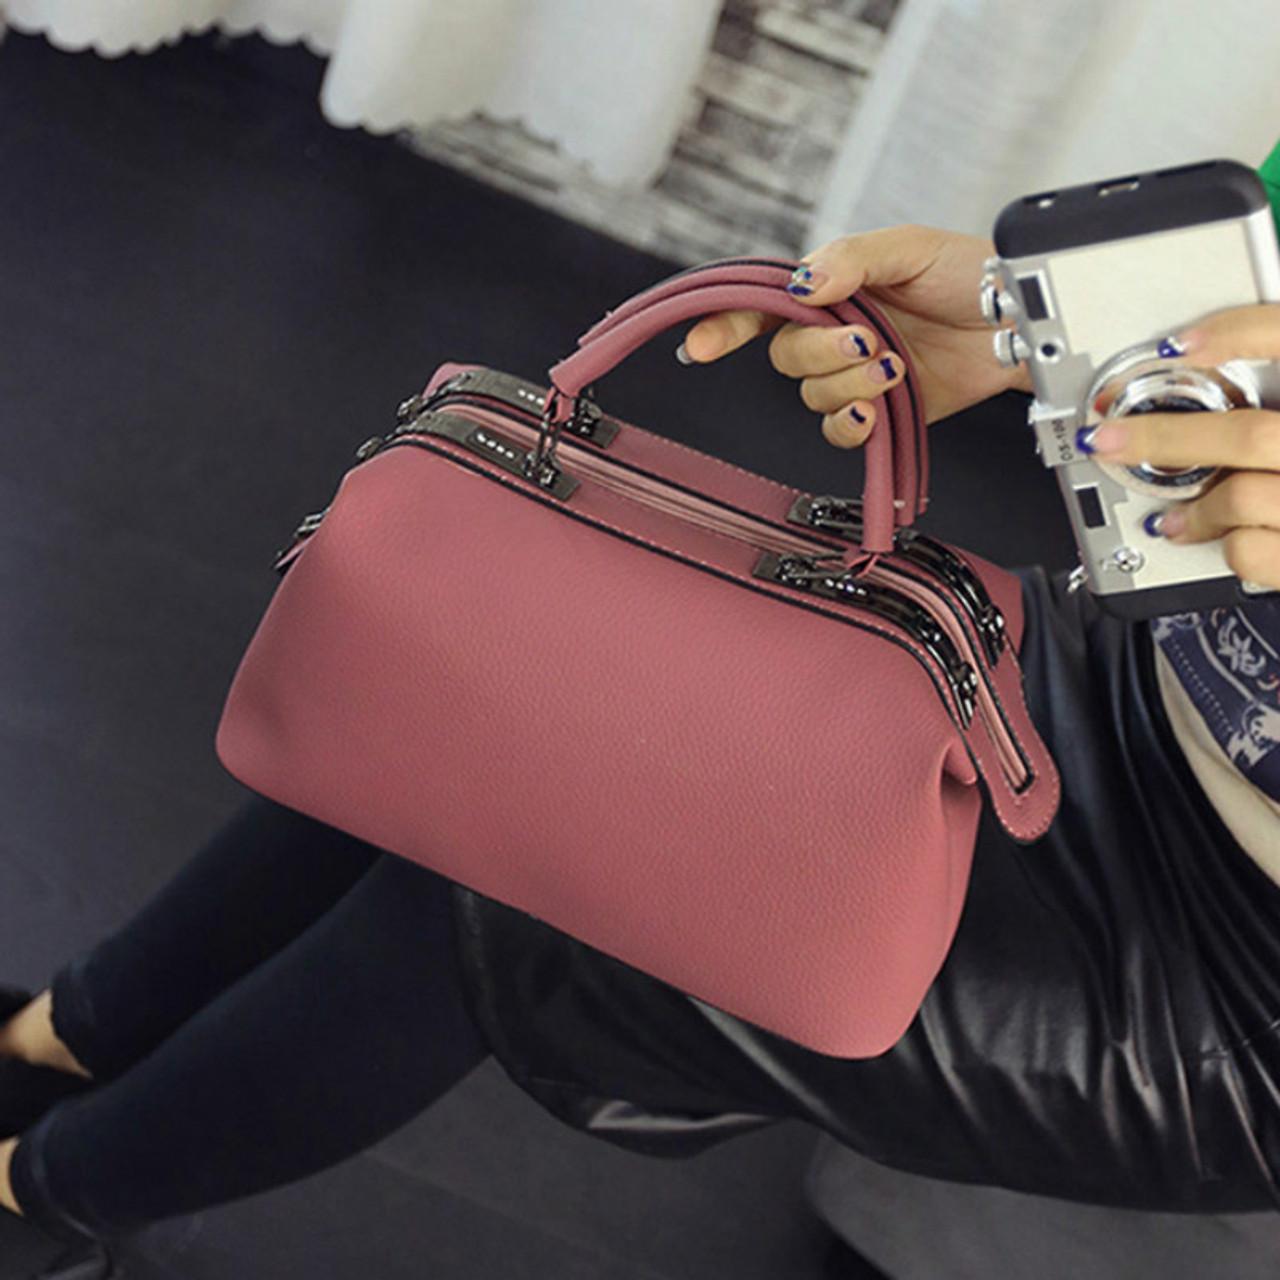 2abcf4571 DAUNAVIA 2018 Brand Fashion Boston handbags for women famous designer  leather messenger bags ladies party shoulder ...